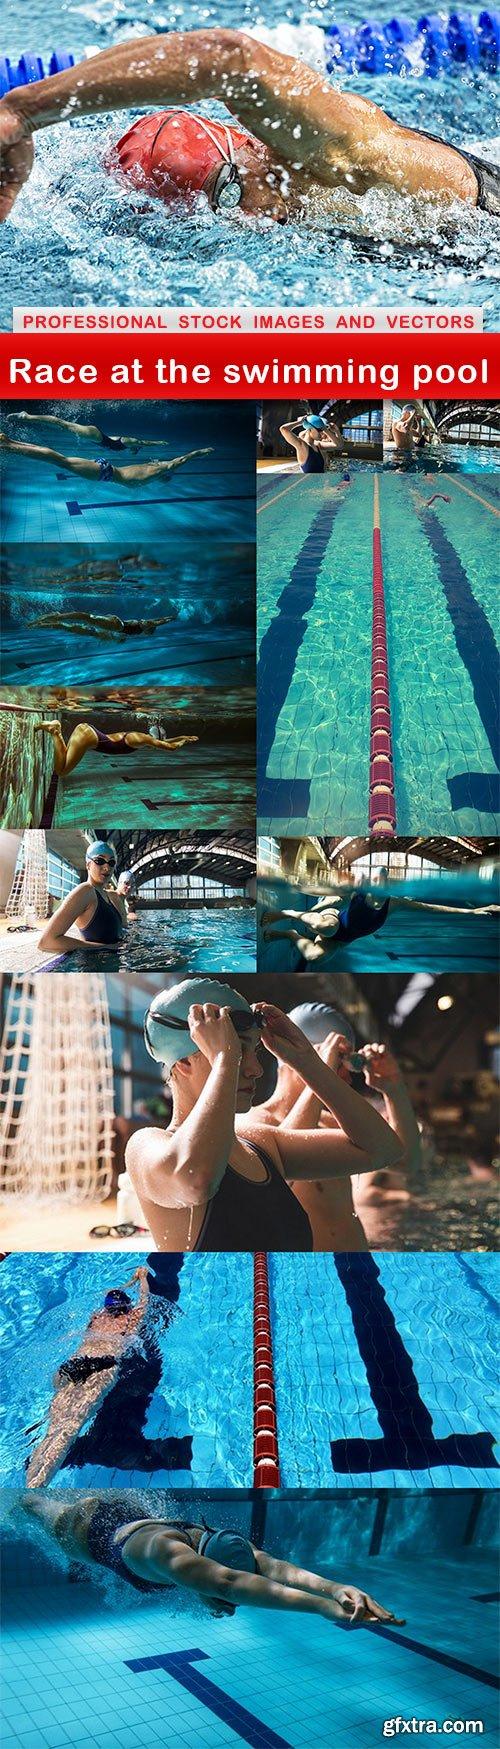 Race at the swimming pool - 12 UHQ JPEG